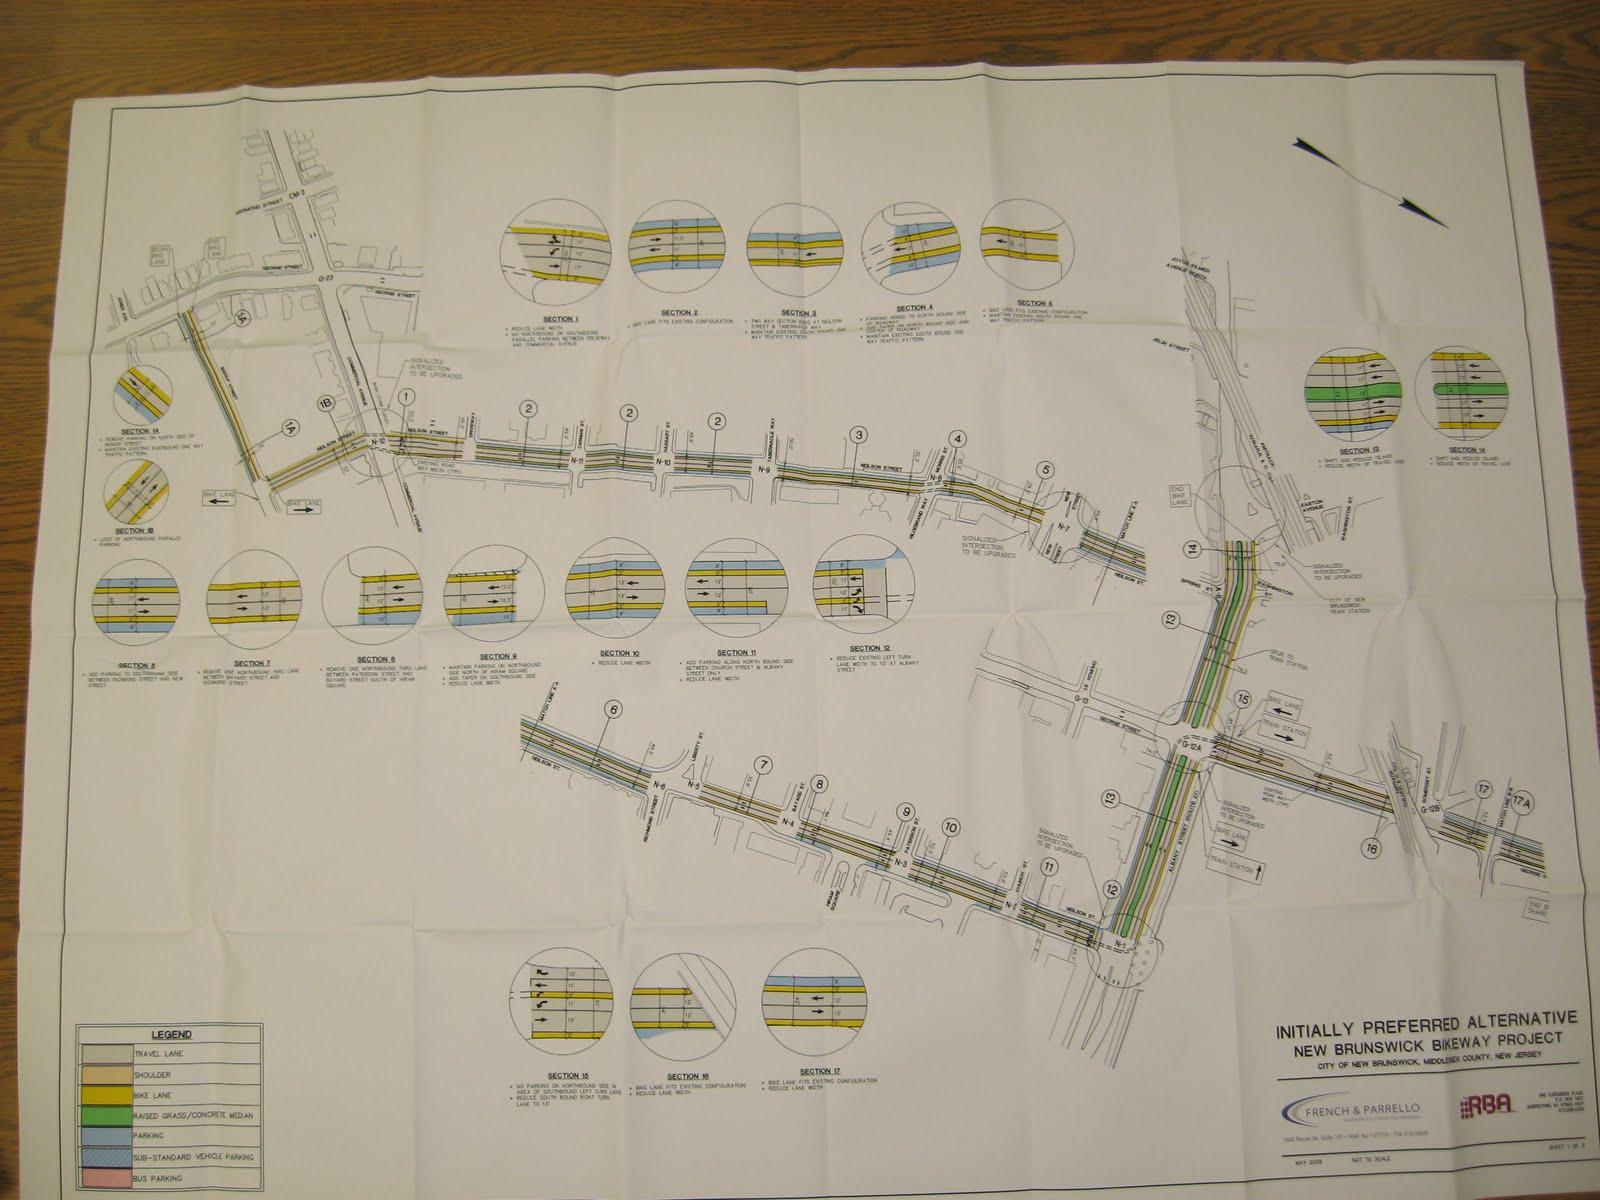 Vision Zero NJ: The New Brunswick Bikeway – Much more than